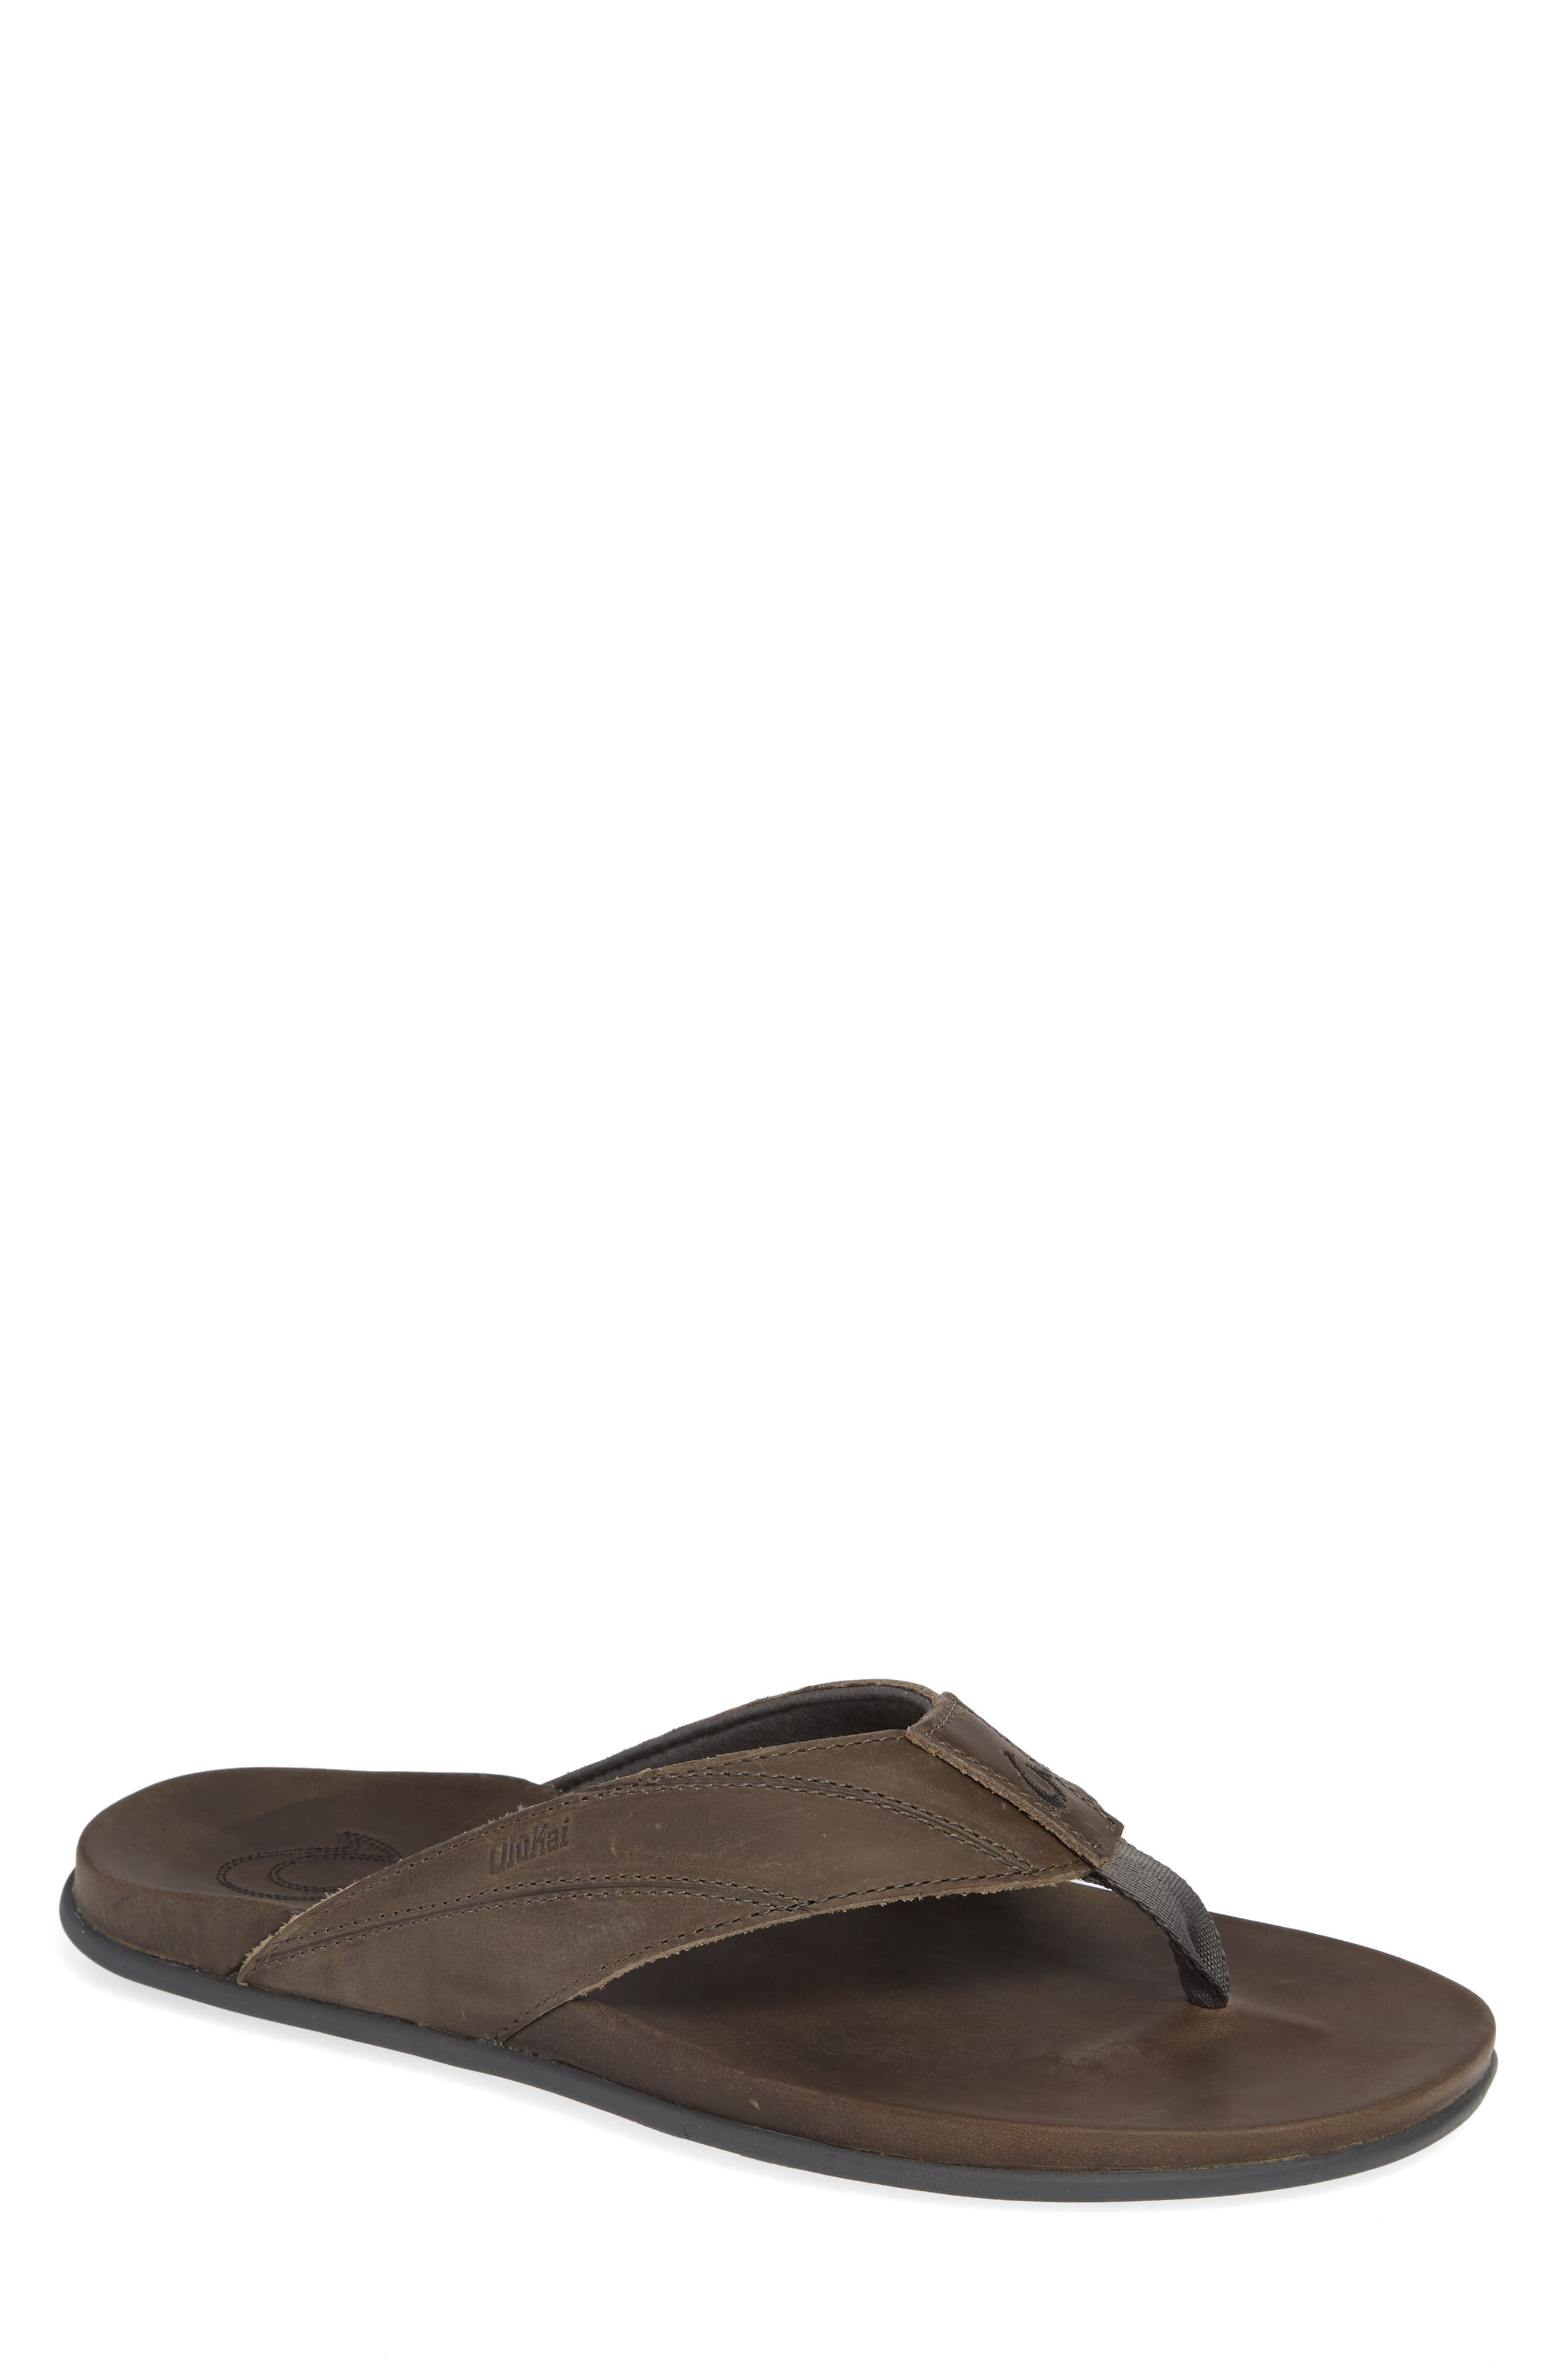 Pikoi Flip Flop,                             Main thumbnail 1, color,                             Storm Grey/ Storm Grey Leather